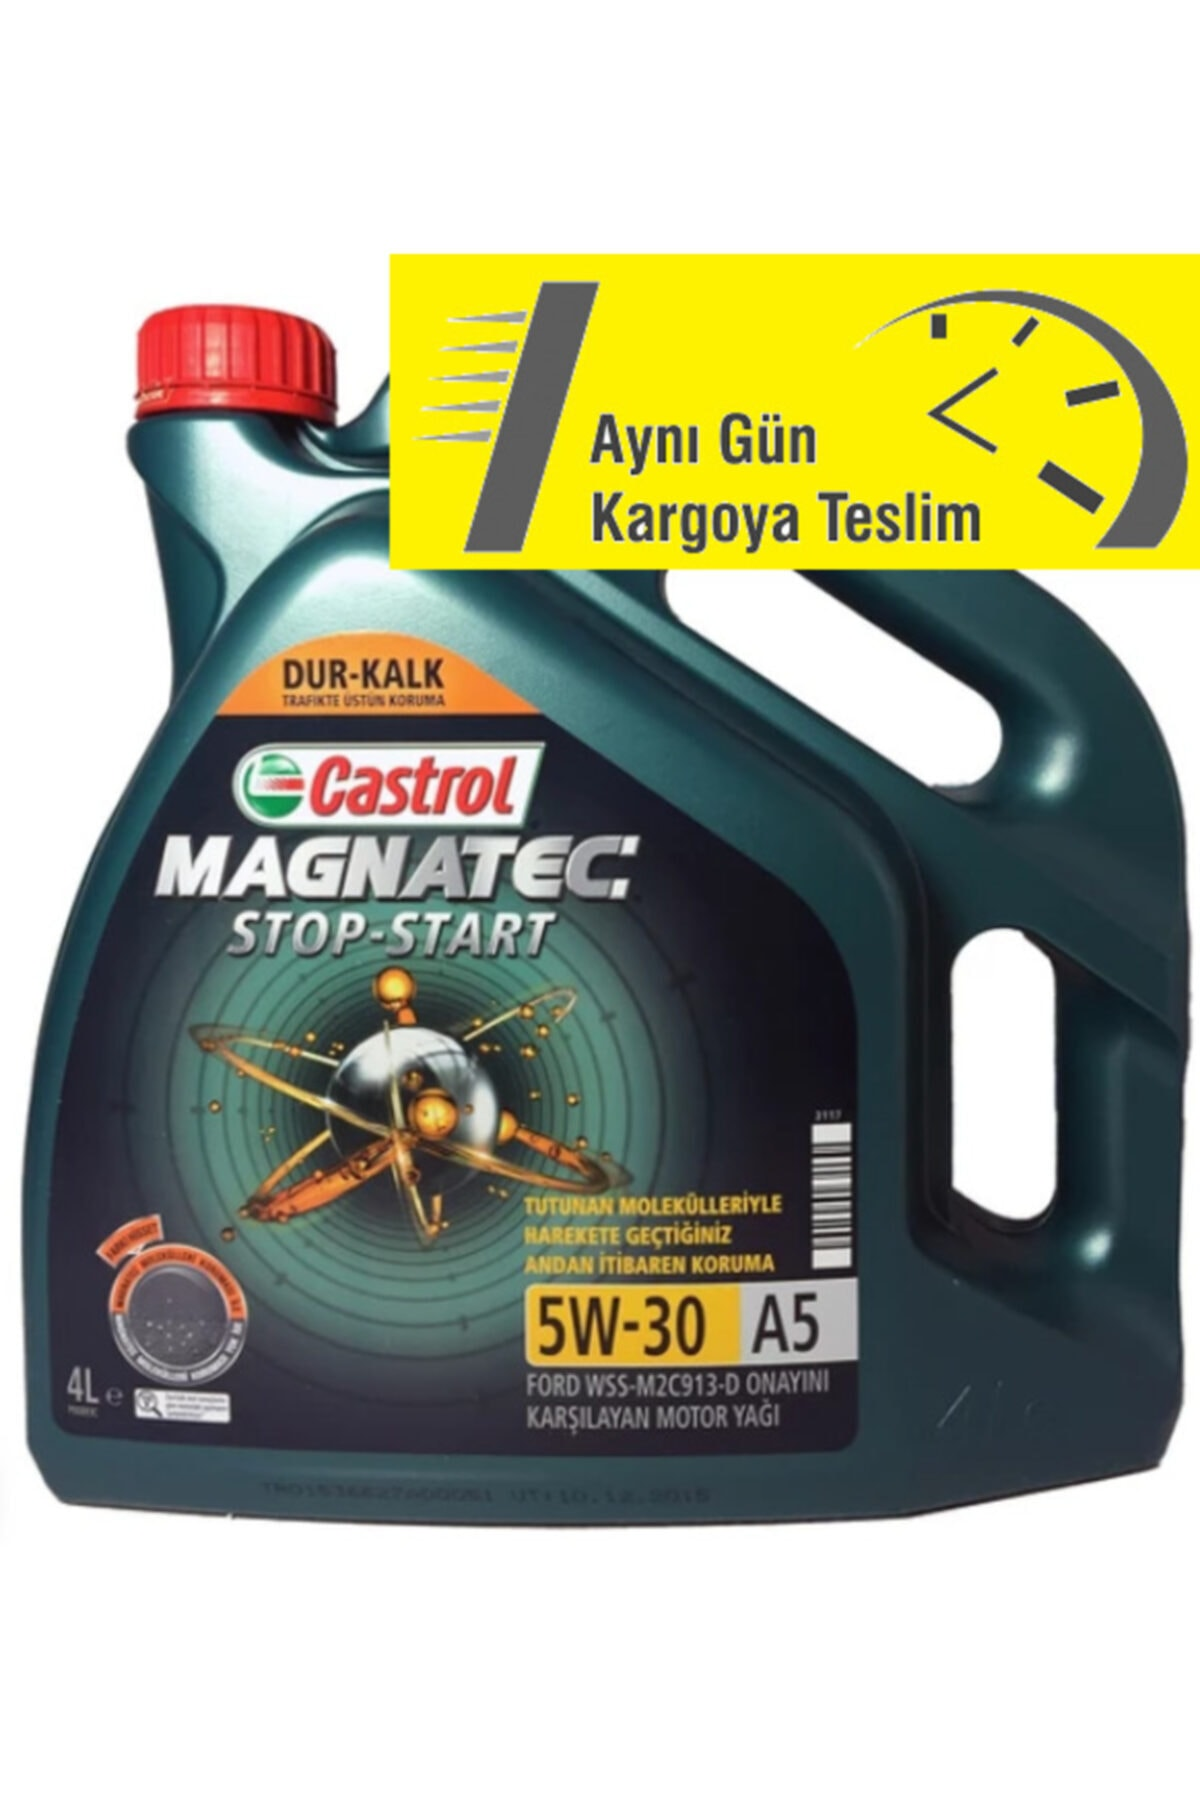 C Magnetec St-st 5w-30 A5 4l Tu